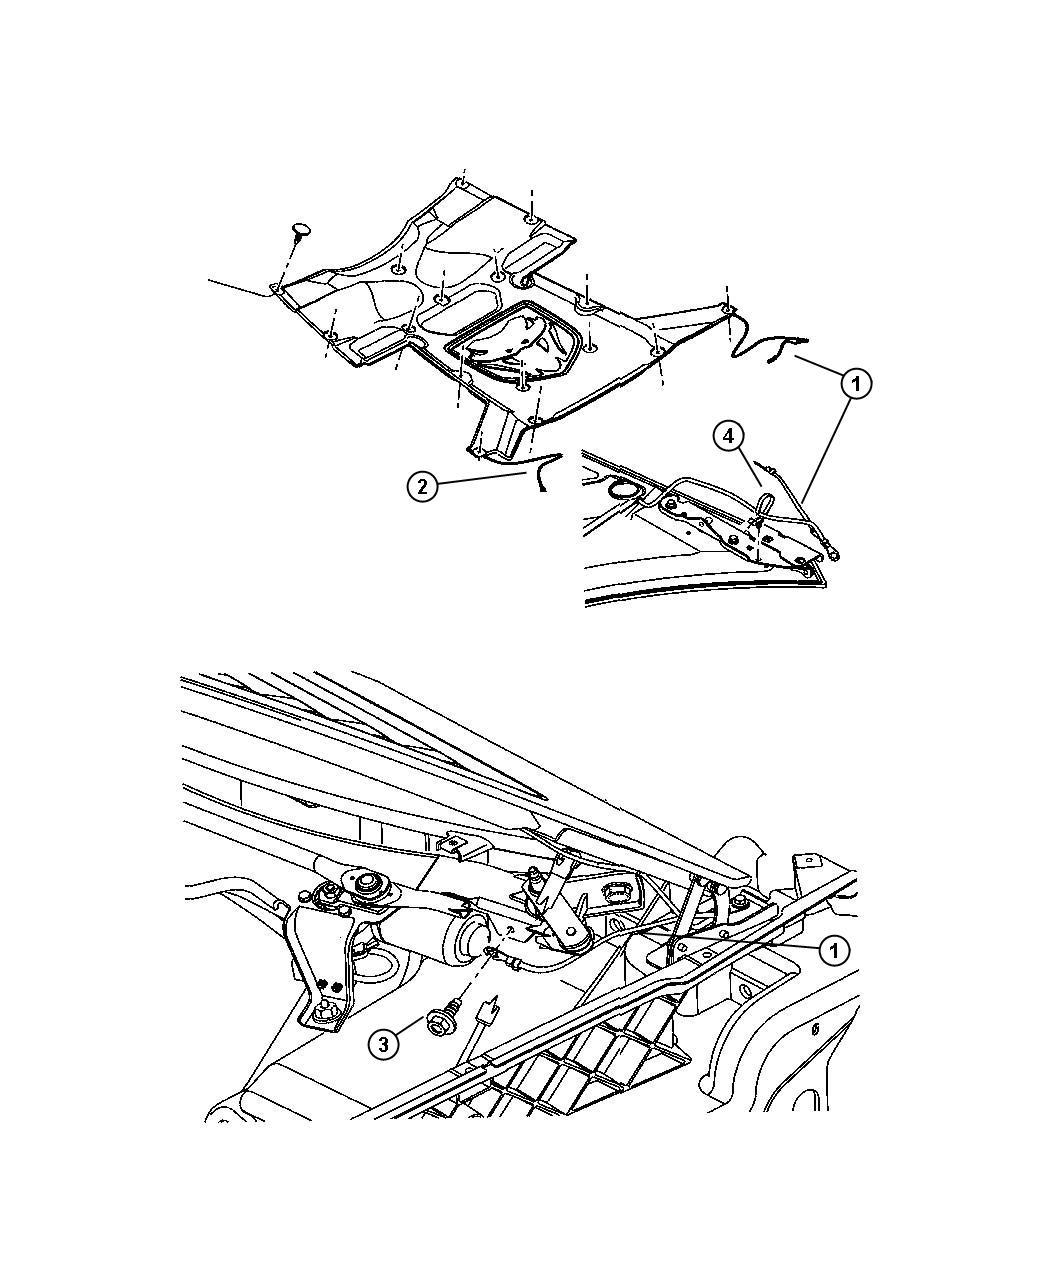 2004 dodge viper strap  right  ground  repair  mopar